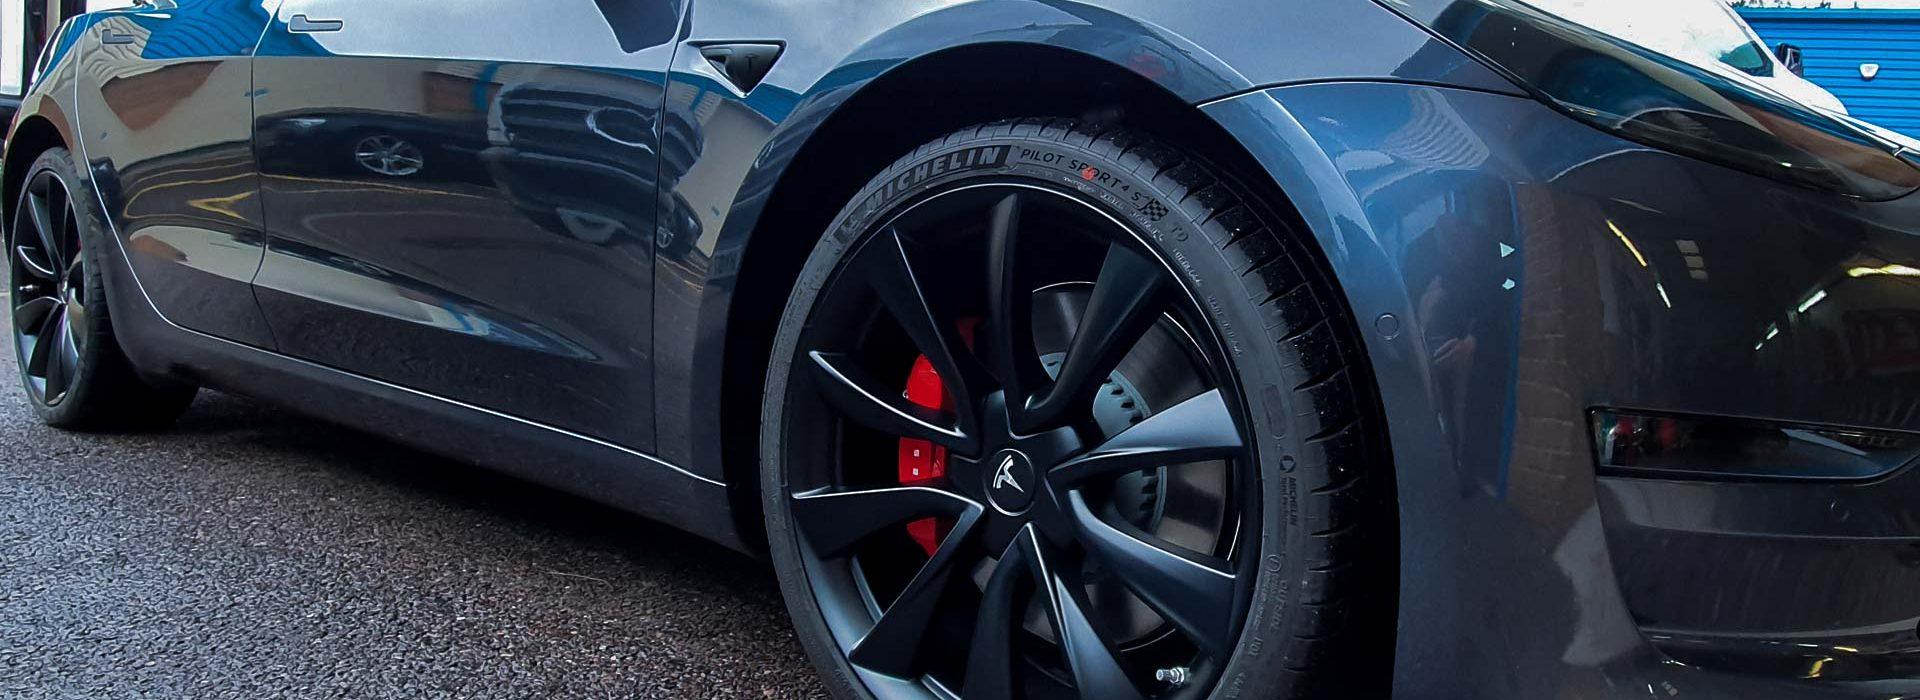 Portfolio - Tesla Car Wrap Wheels - Insignia Signs